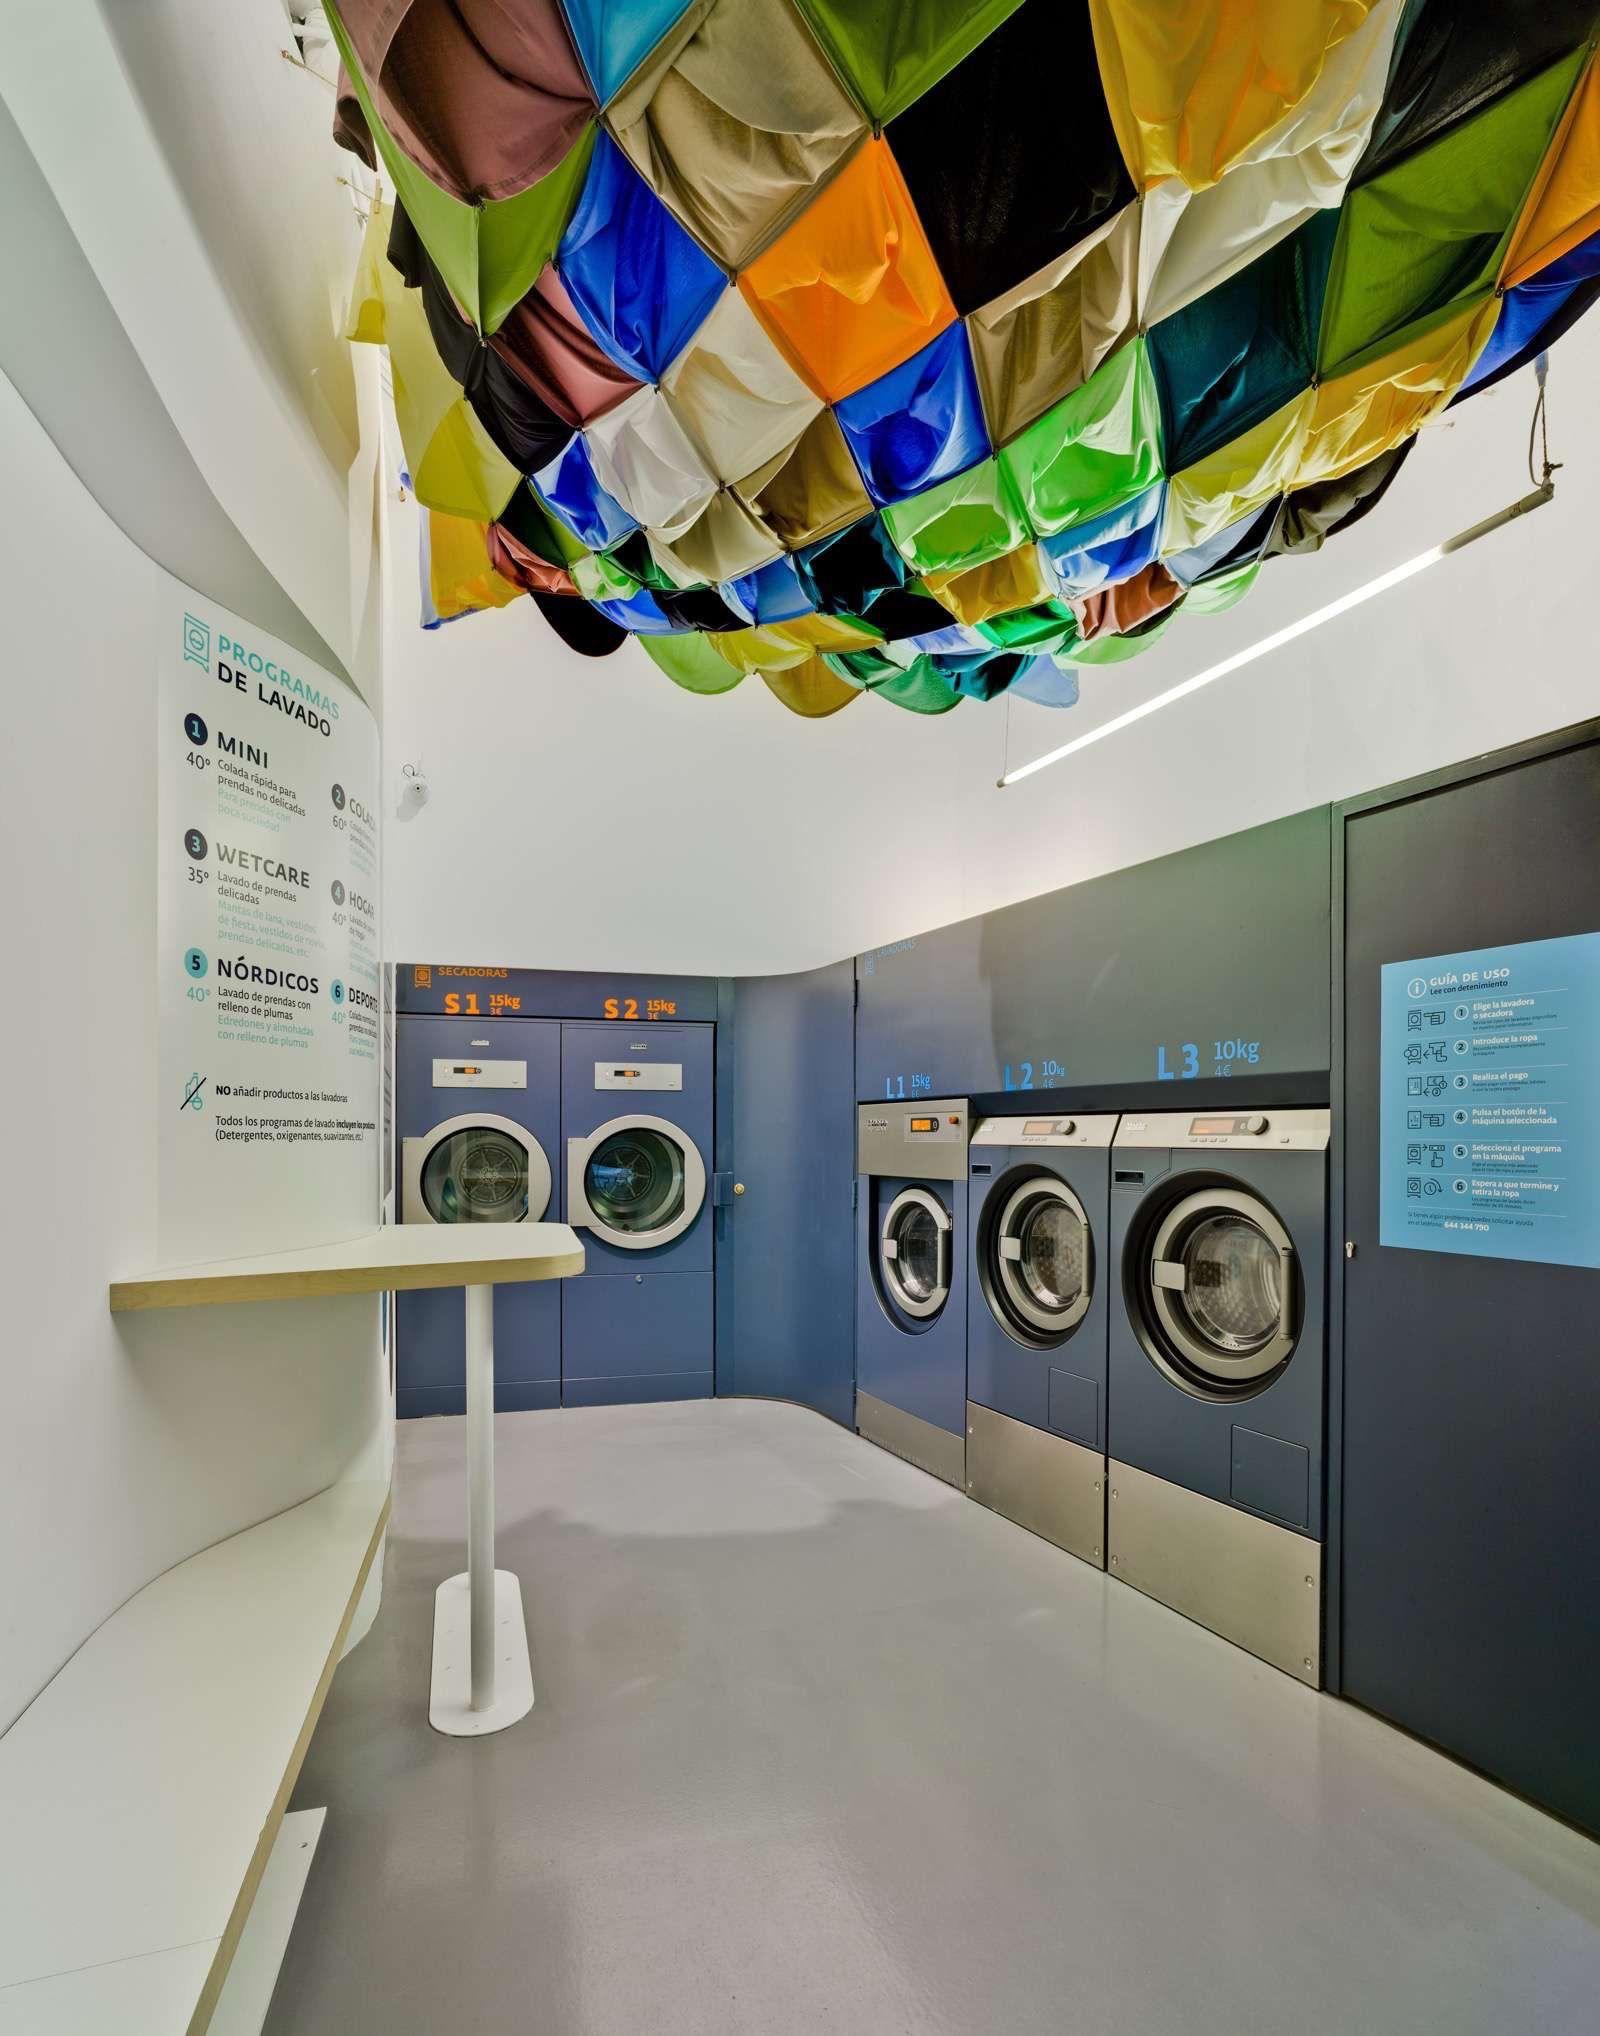 El Tendero Antoni Macia A And D Ilikearch 2 Laundry Shop